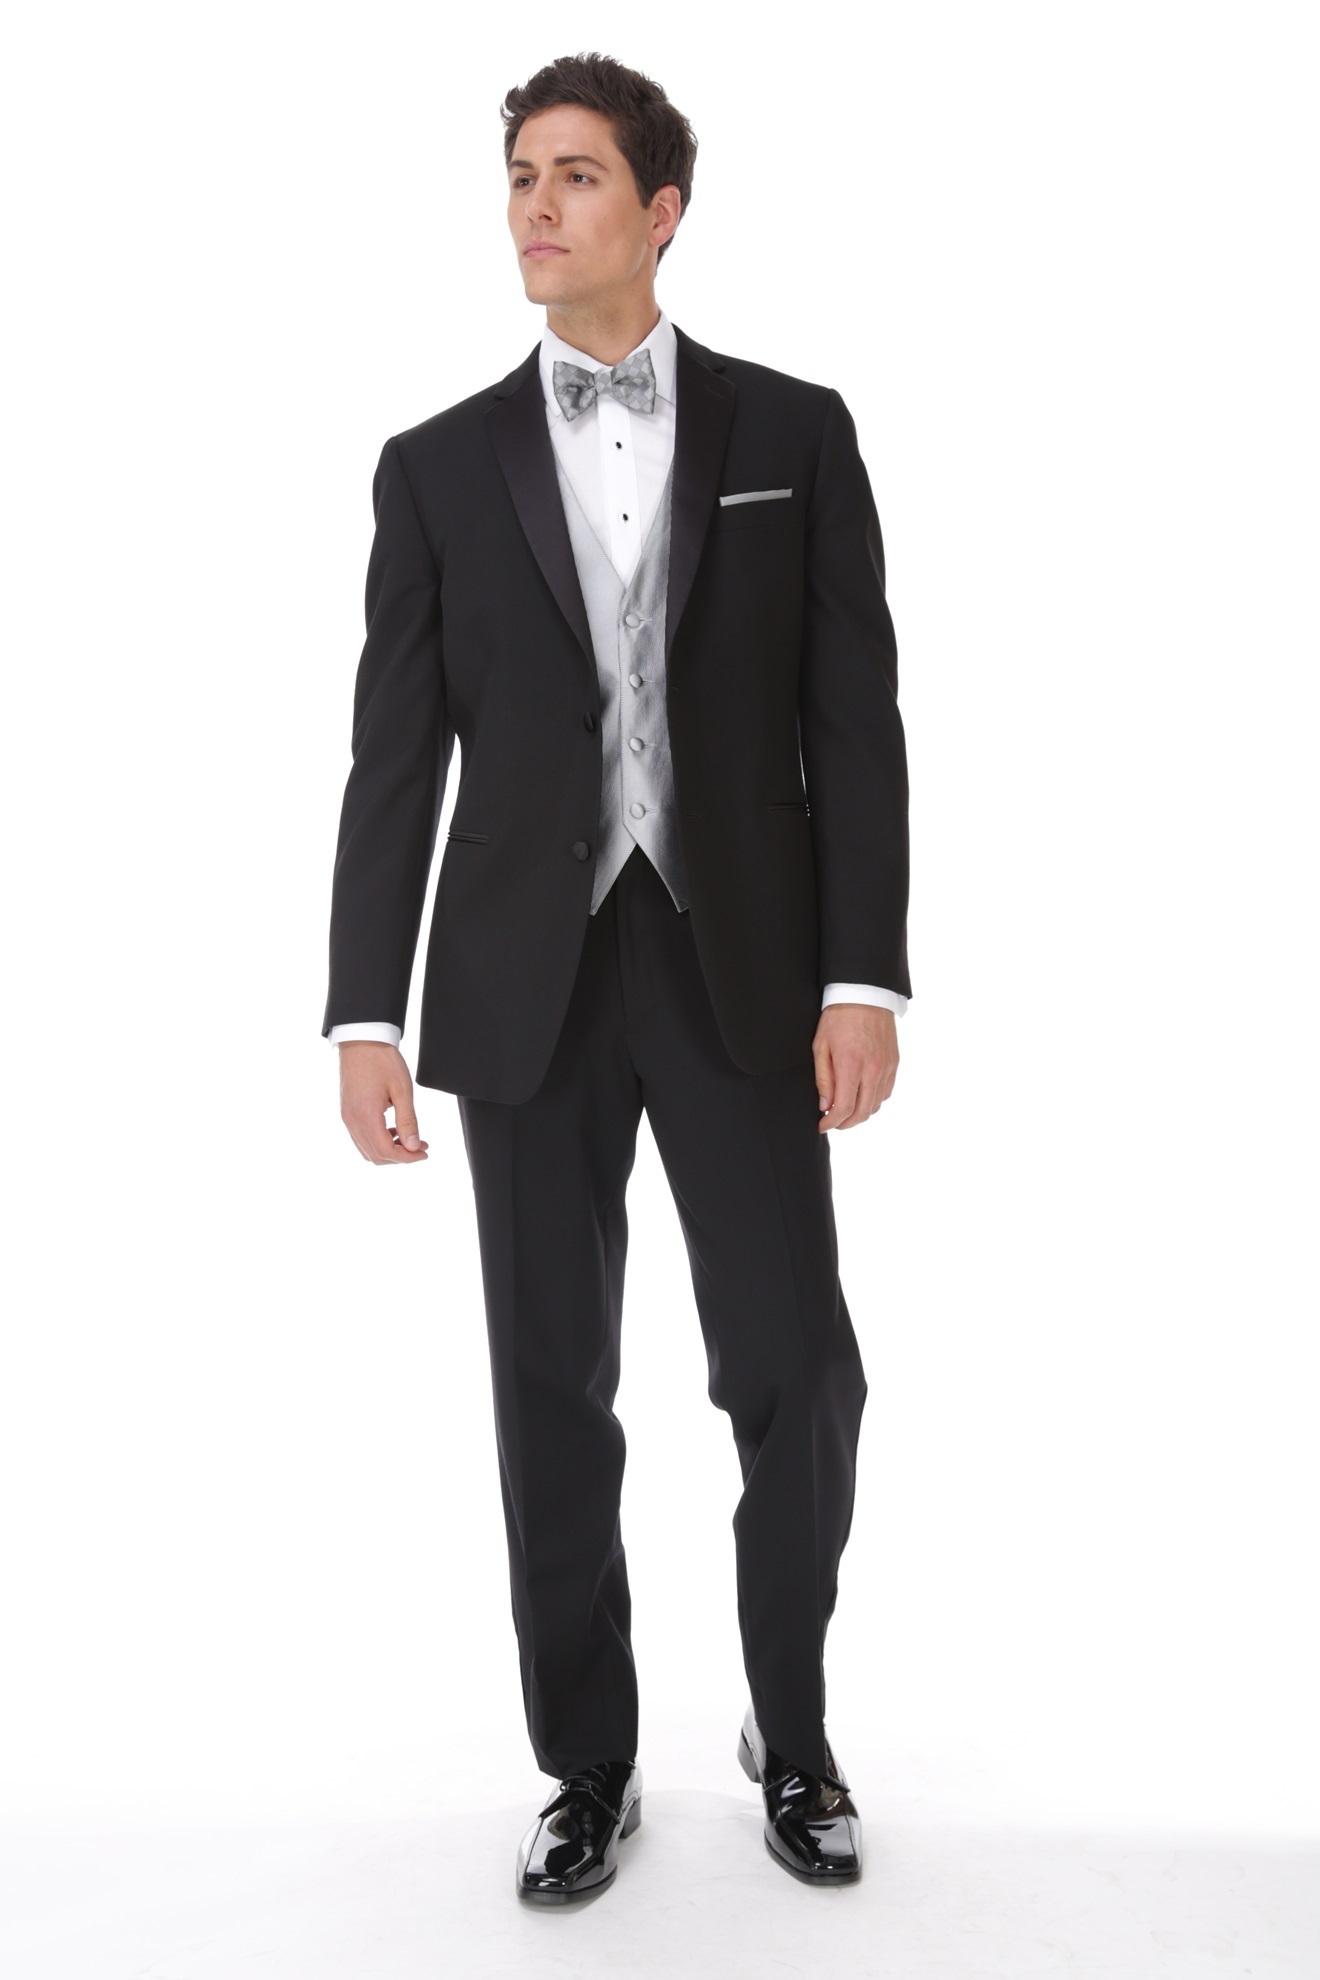 Milroy 39 s tuxedos black classic notch tuxedo for Tuxedo house